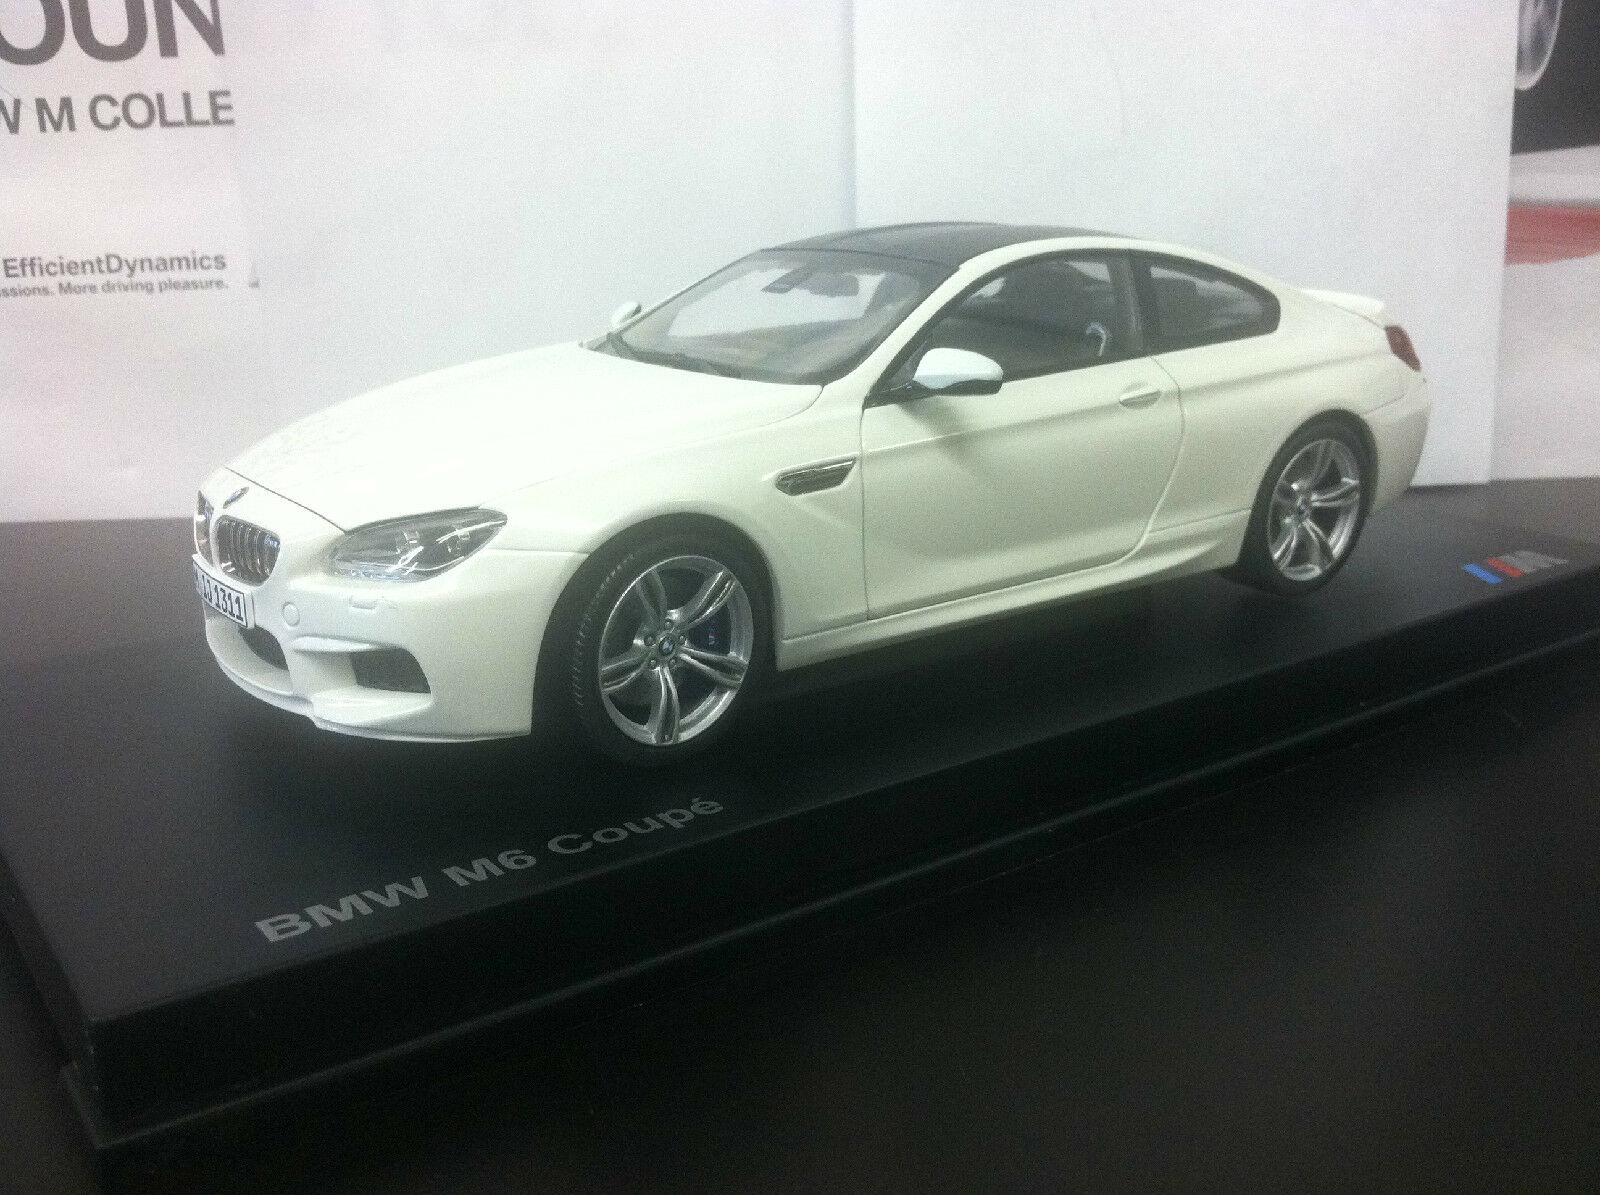 2013 BMW M6 F13 Coupe  Alpine bianca 1 18th    Factory BMW Diecast